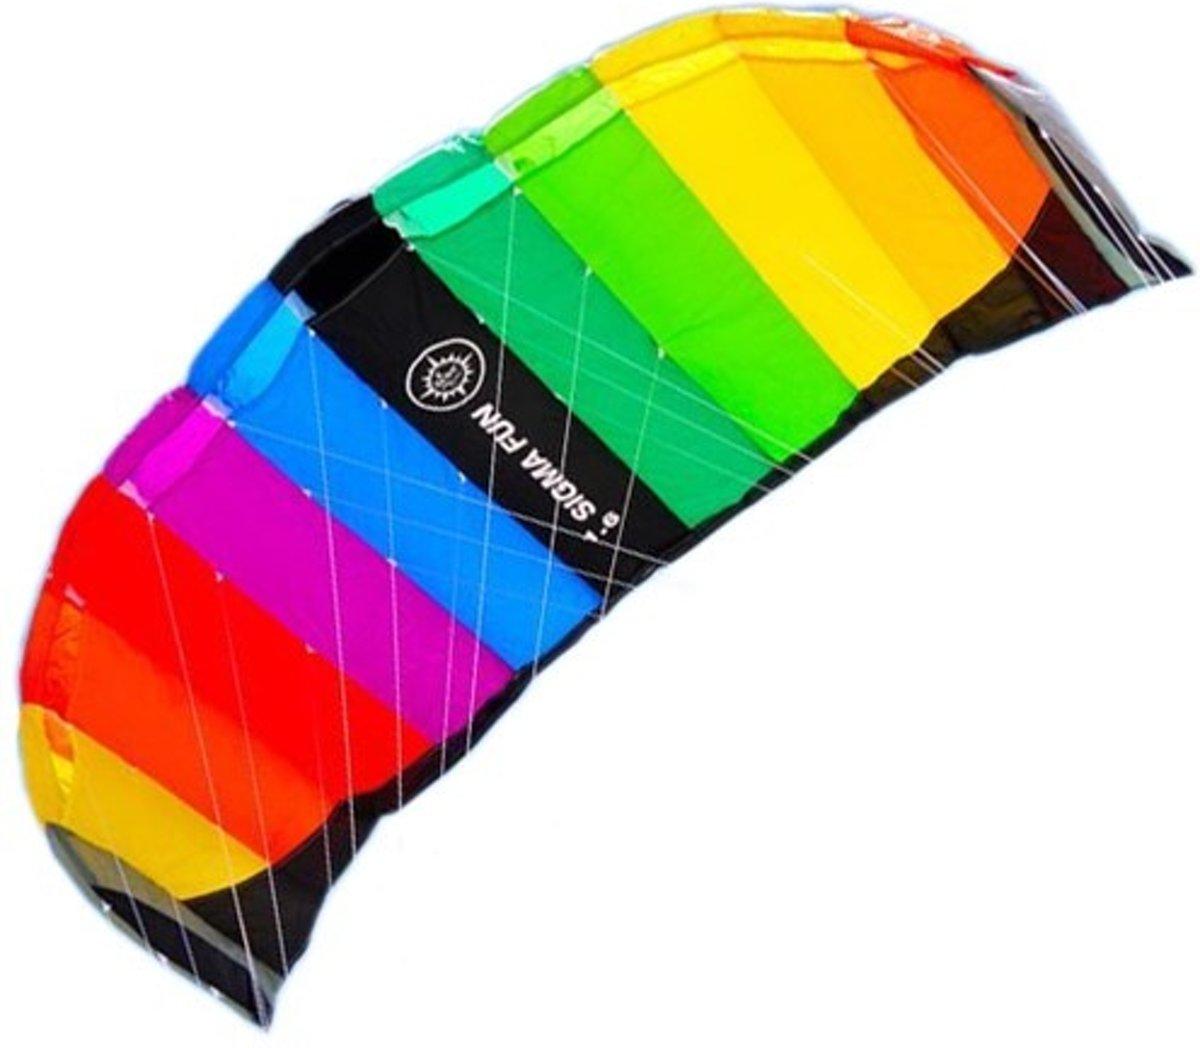 Elliot Sigma Fun Rainbow - Matrasvlieger - 165cm spanwijdte